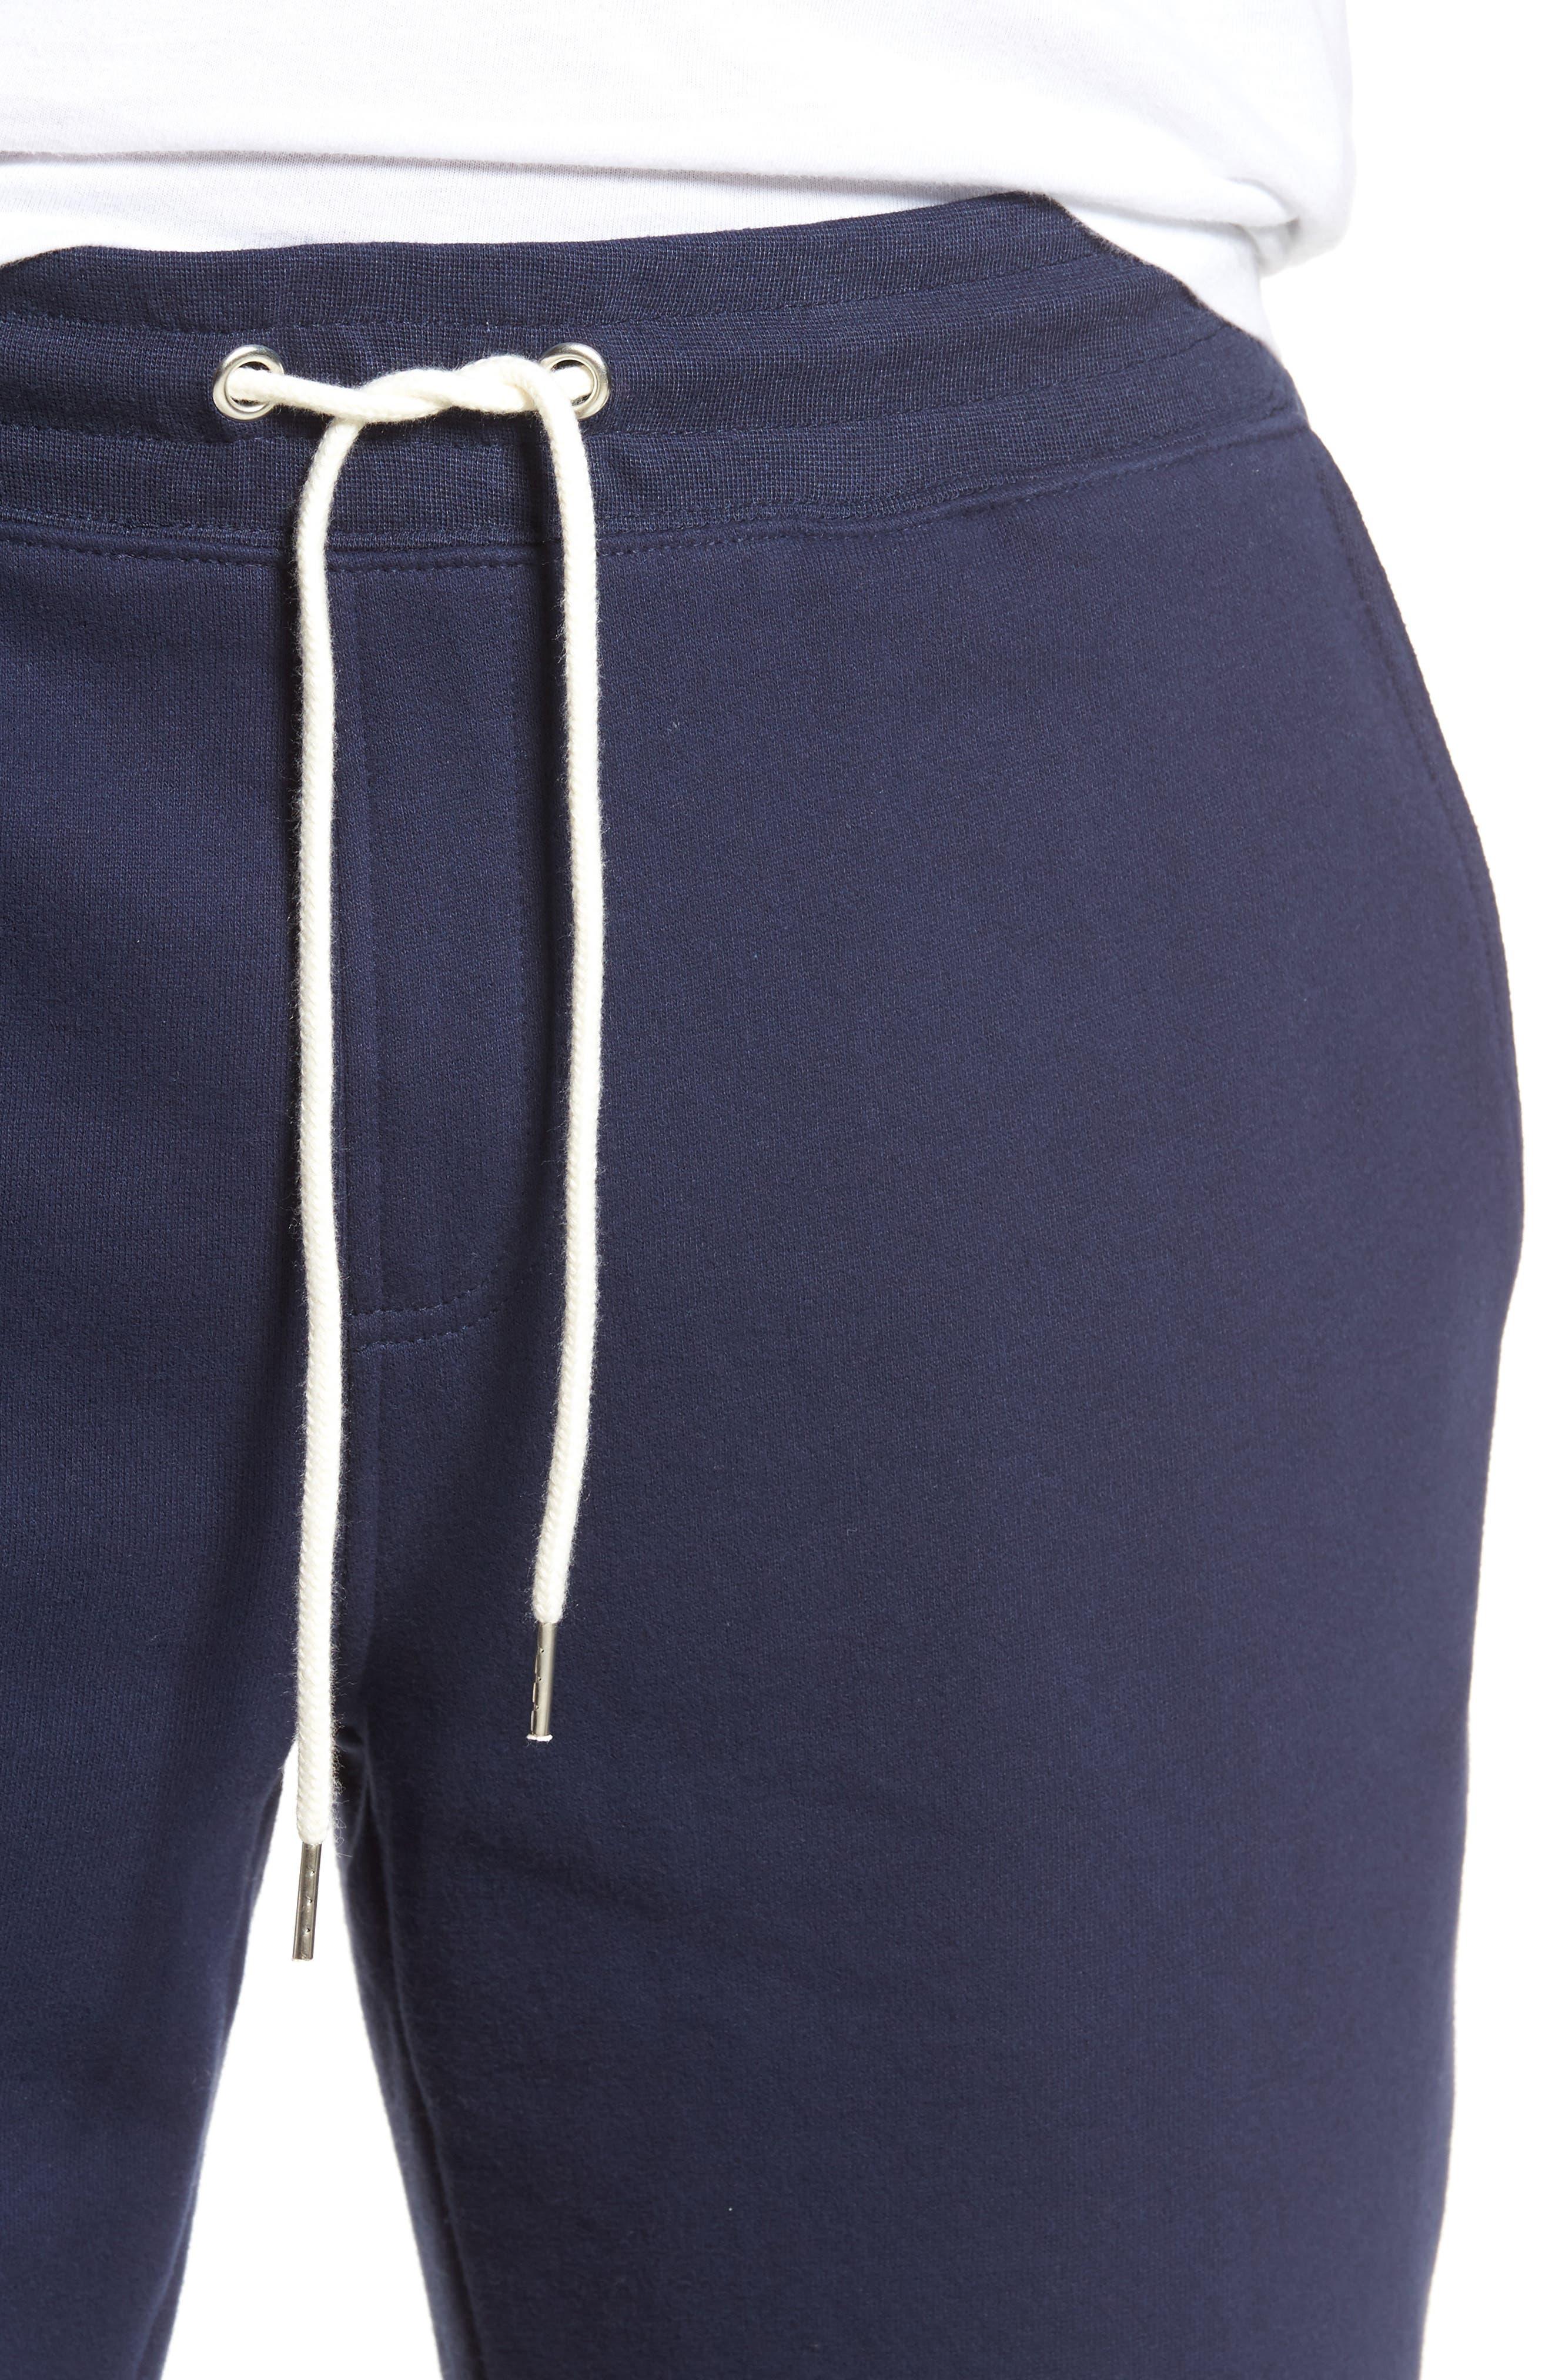 Fleece Shorts,                             Alternate thumbnail 4, color,                             Navy Peacoat